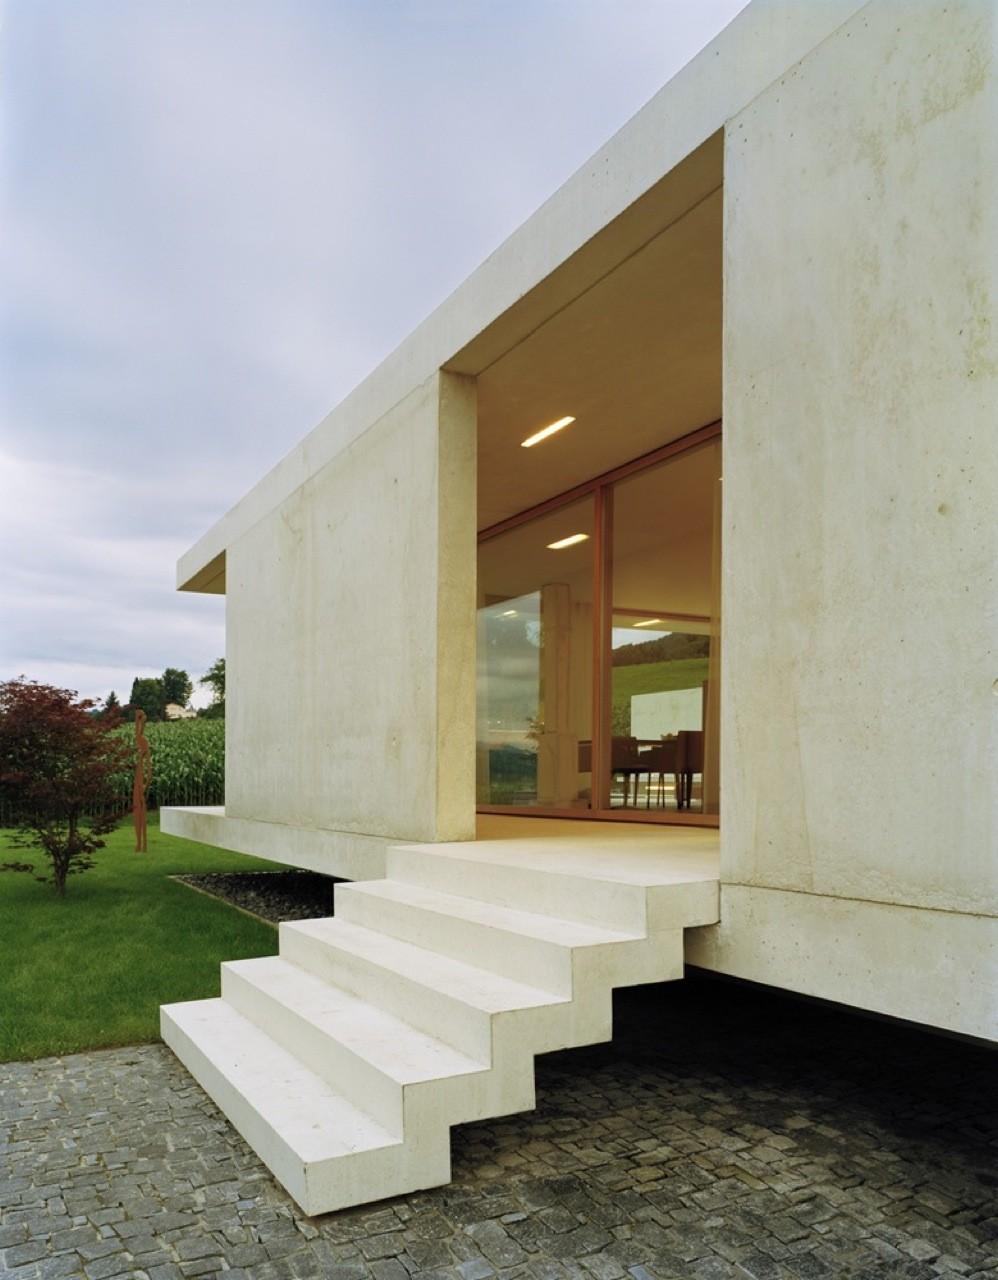 gallery of house at zimmerberg bottom rossetti wyss architekten 3. Black Bedroom Furniture Sets. Home Design Ideas